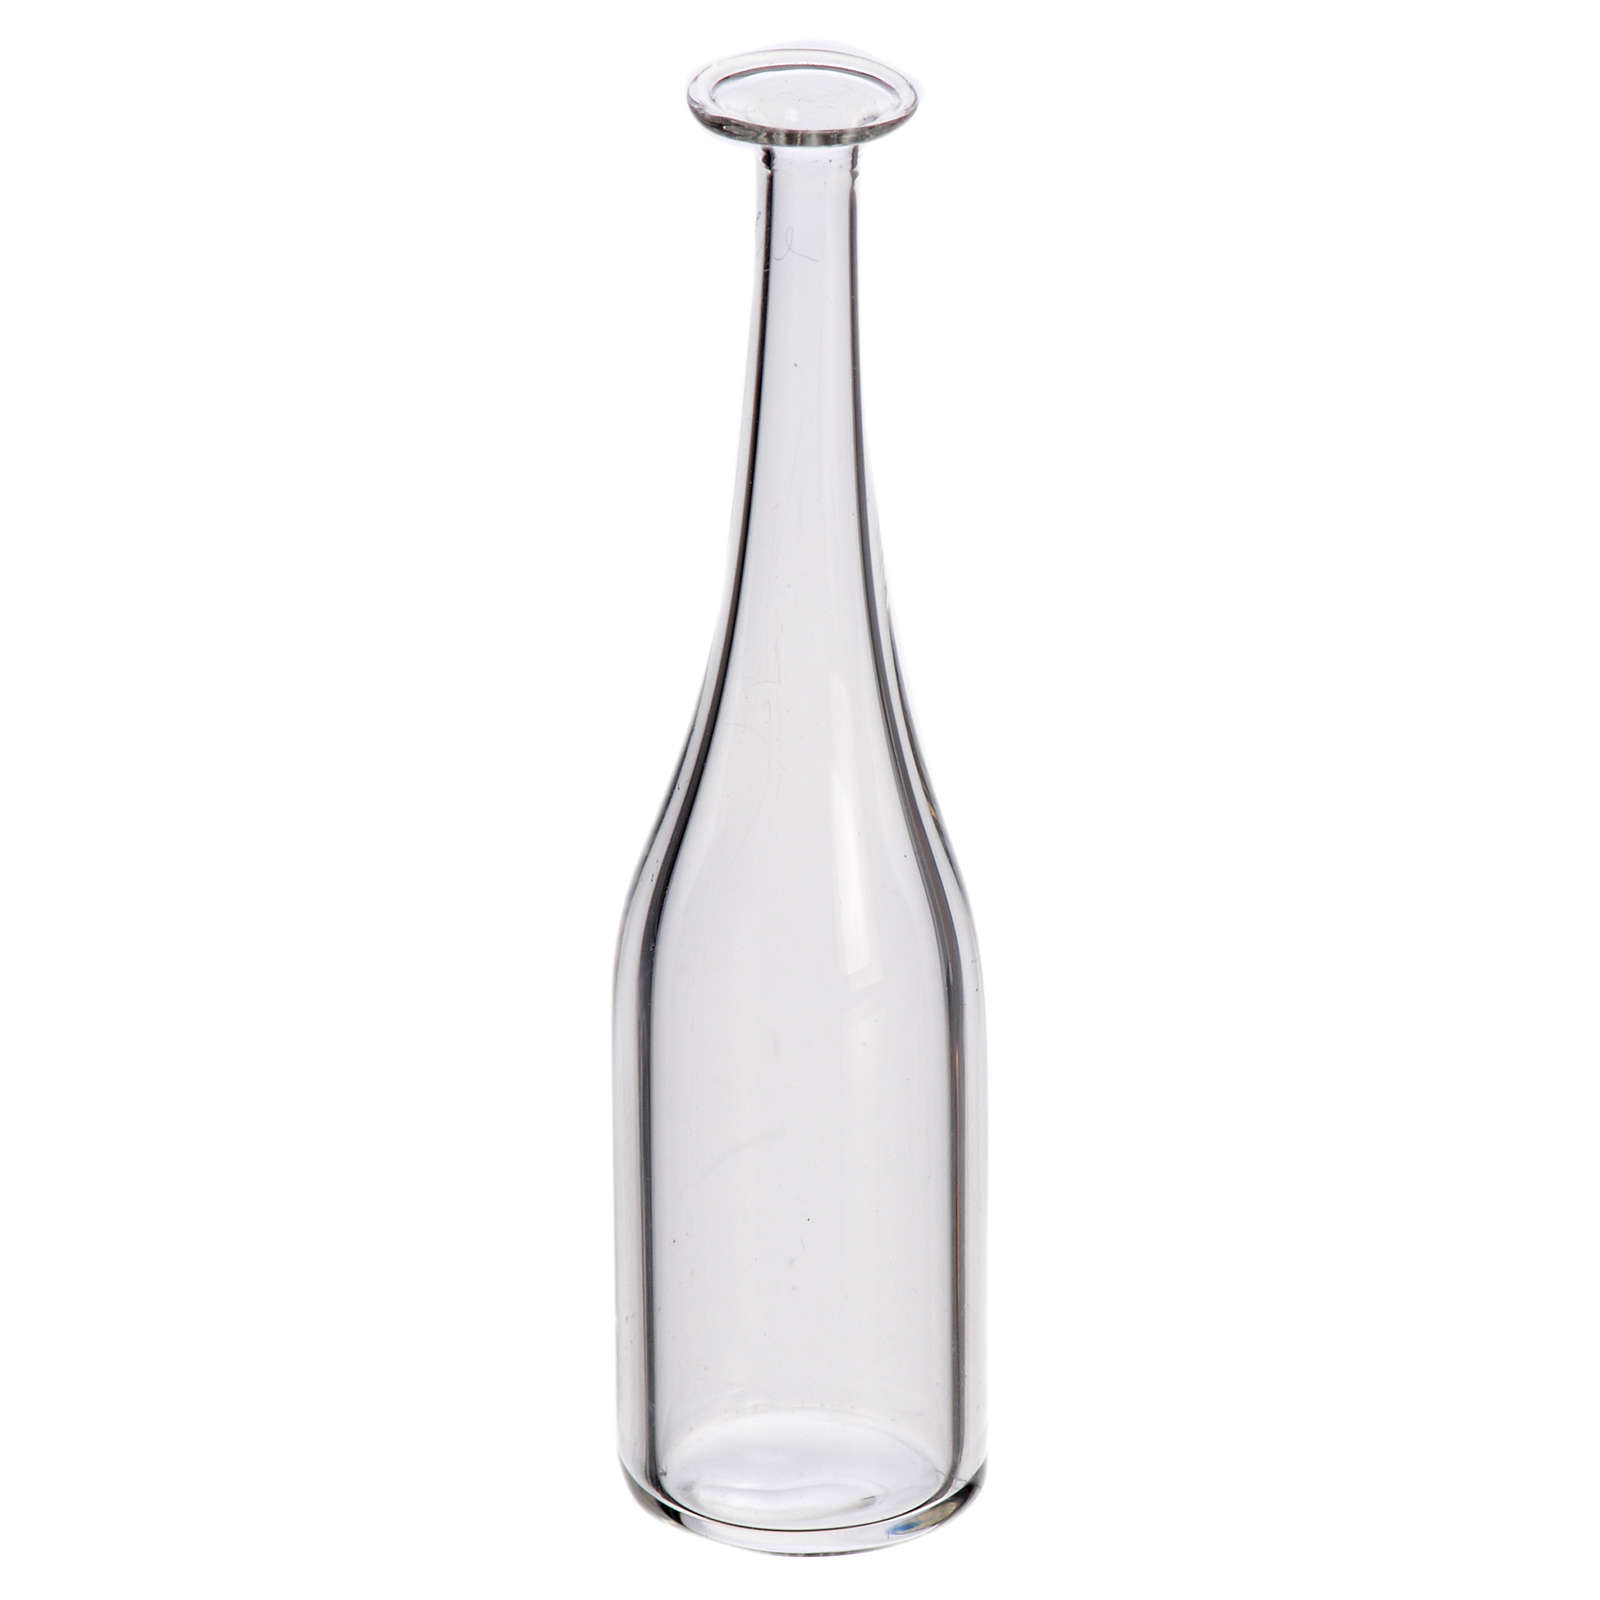 Botella de cristal para belén 2.3x1cm 4